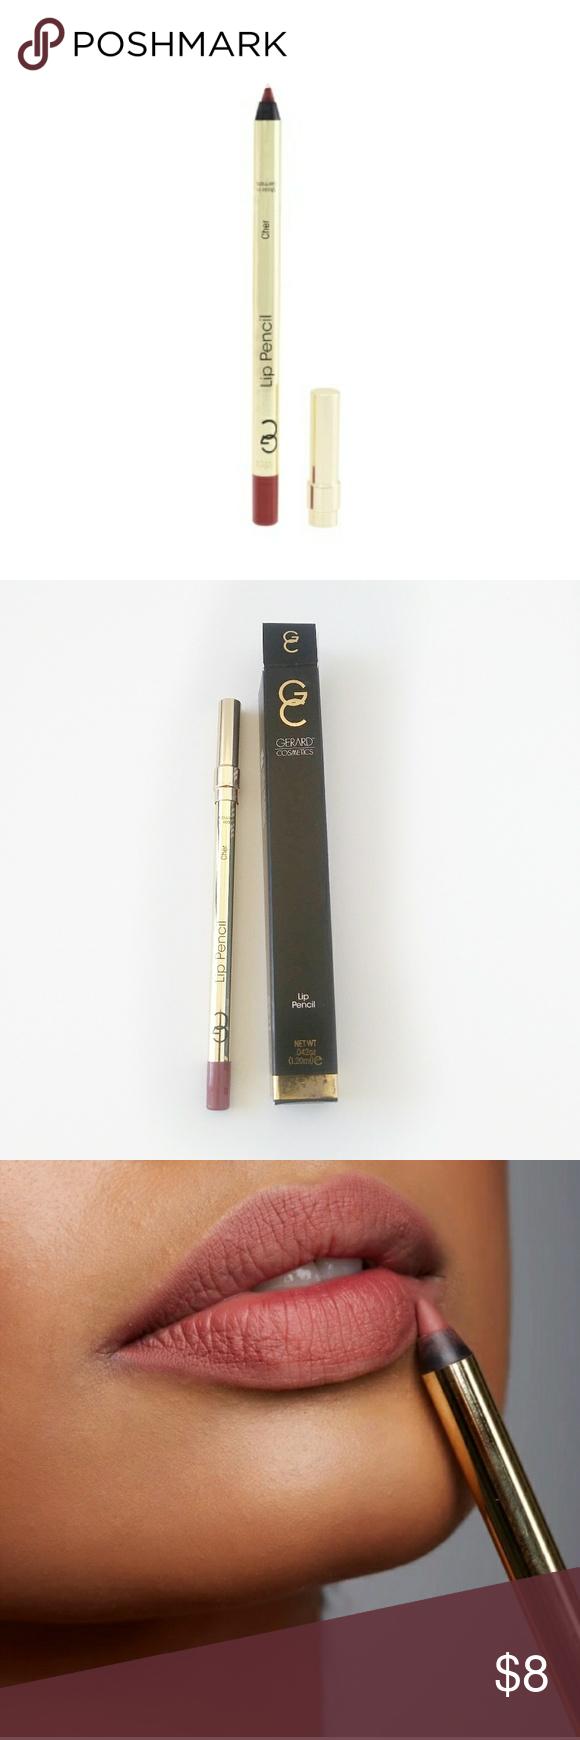 Pin by Laur👅 on Make-up | Gerard cosmetics hydra matte